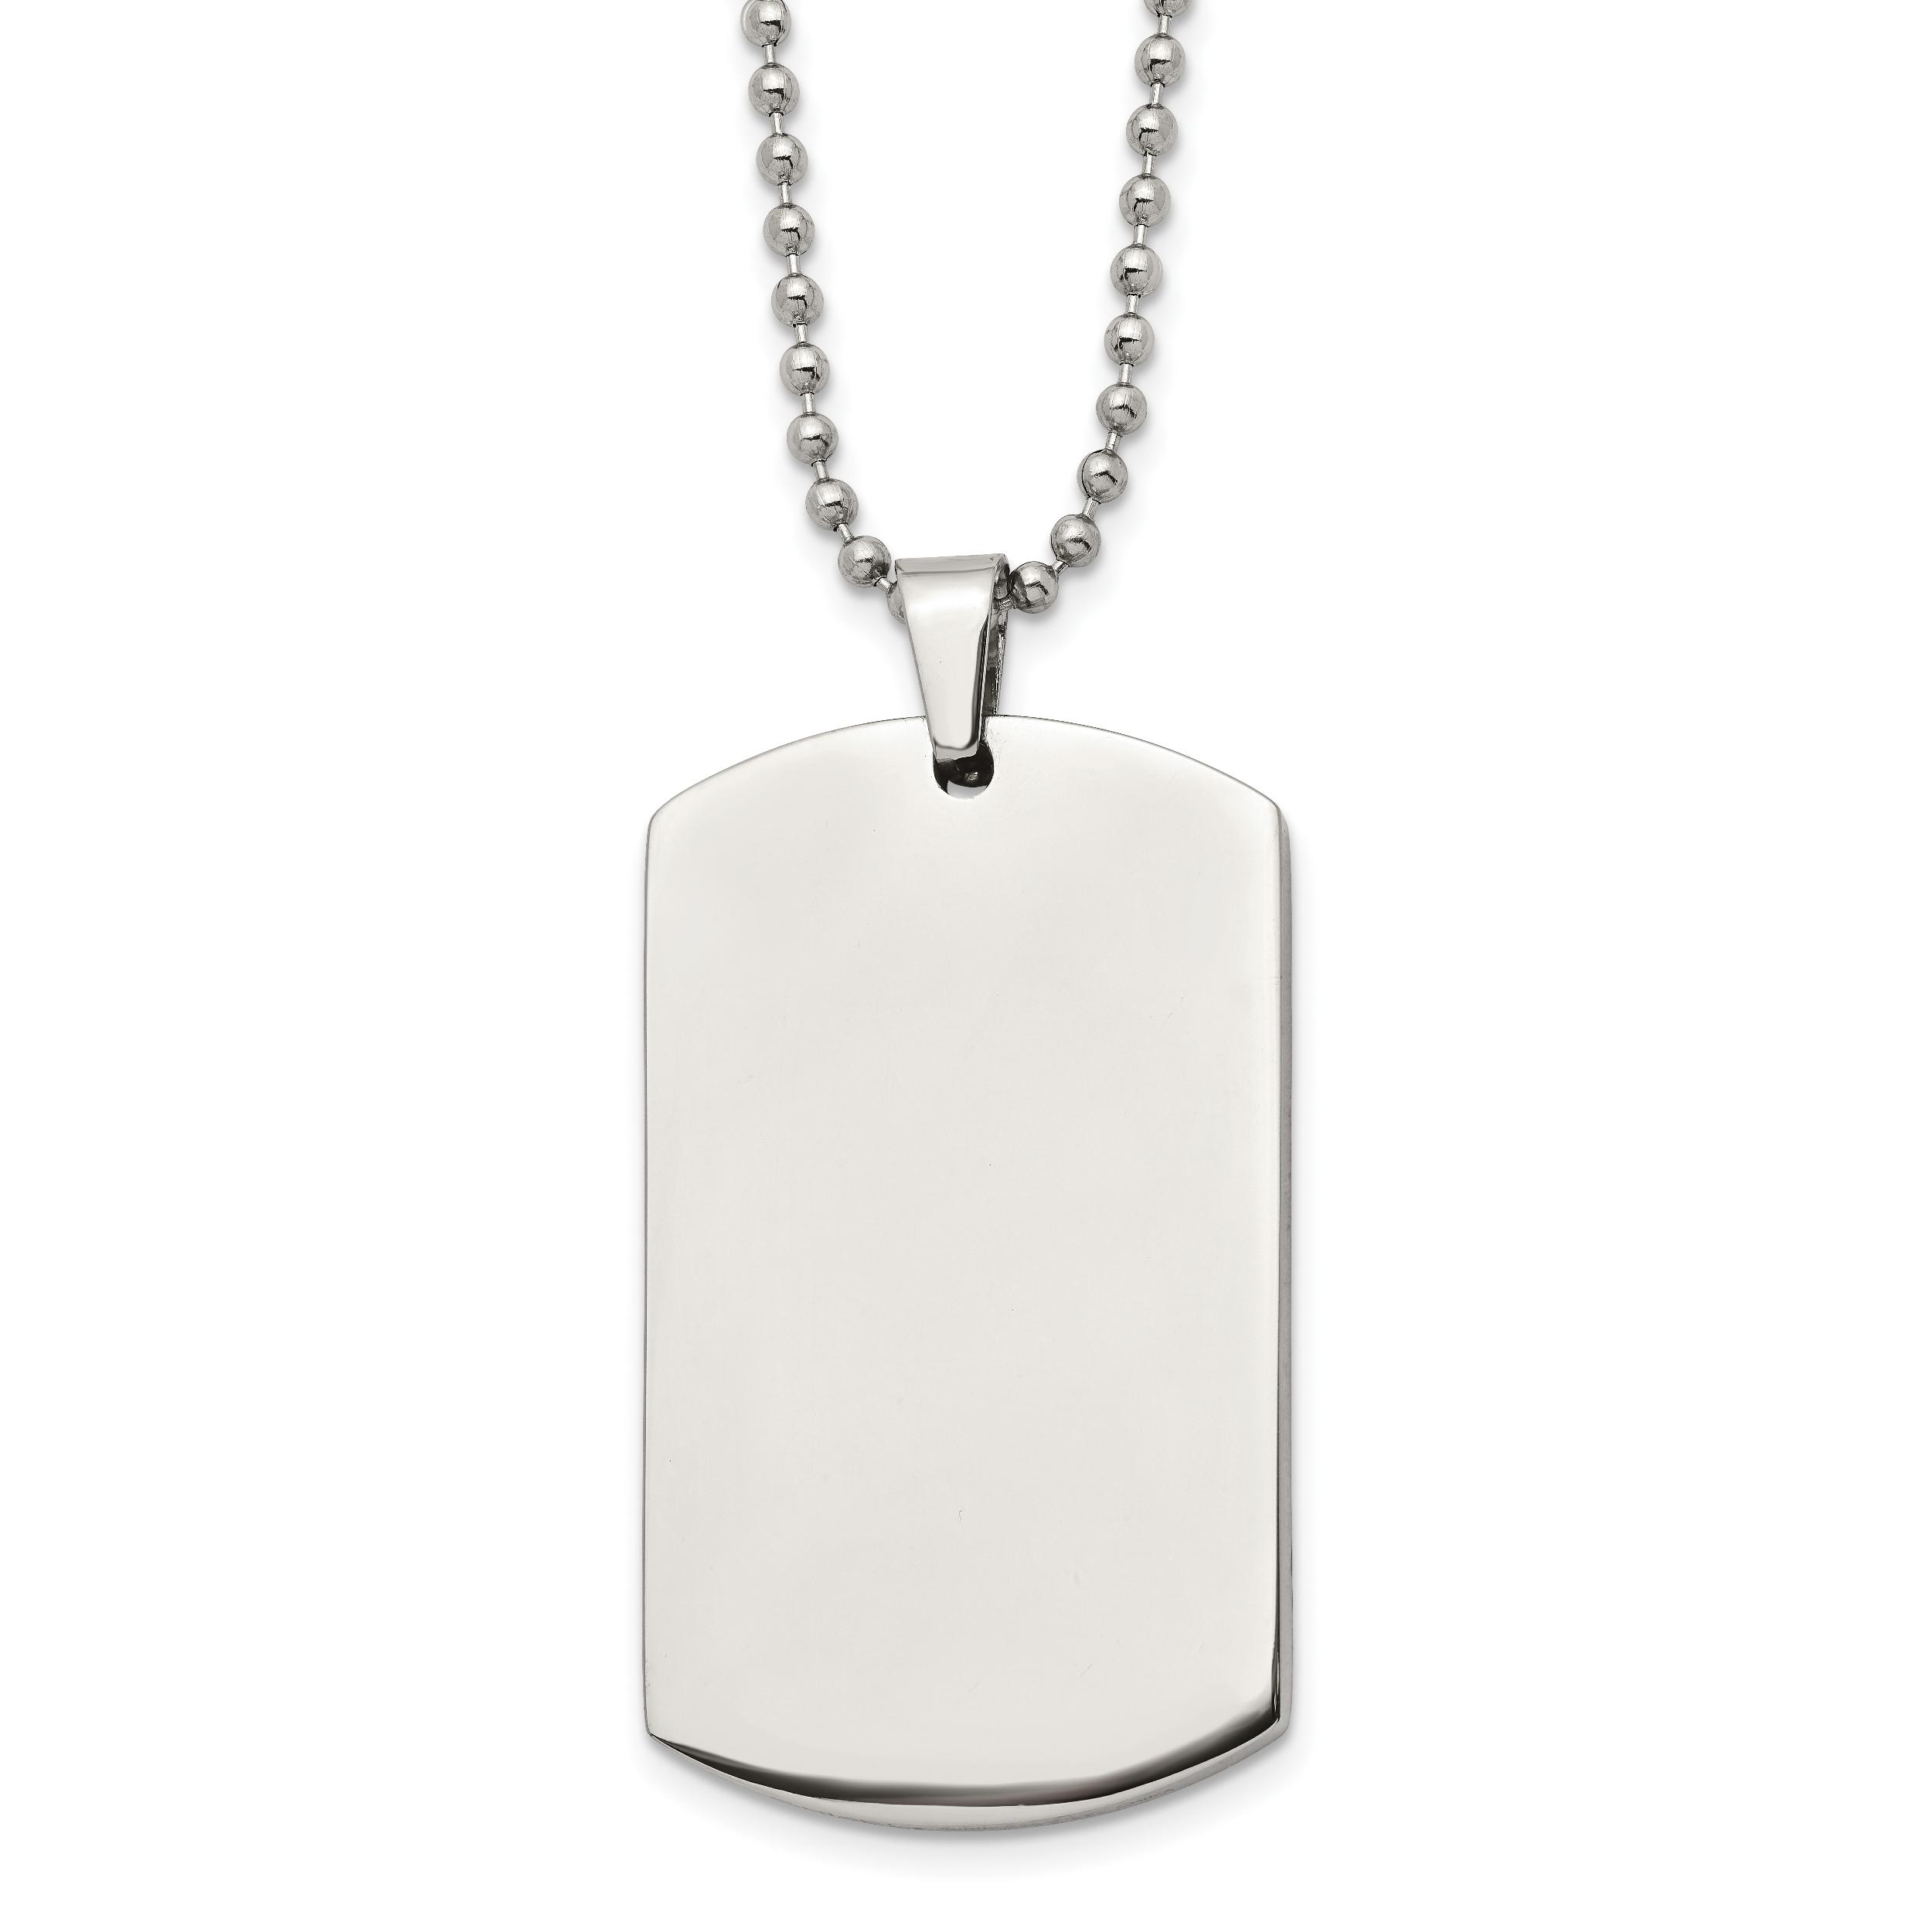 13.4mm x 20.4mm Jewel Tie 14k Yellow Gold 3-CZ Cubic Zirconia Cut-out Heart Pendant